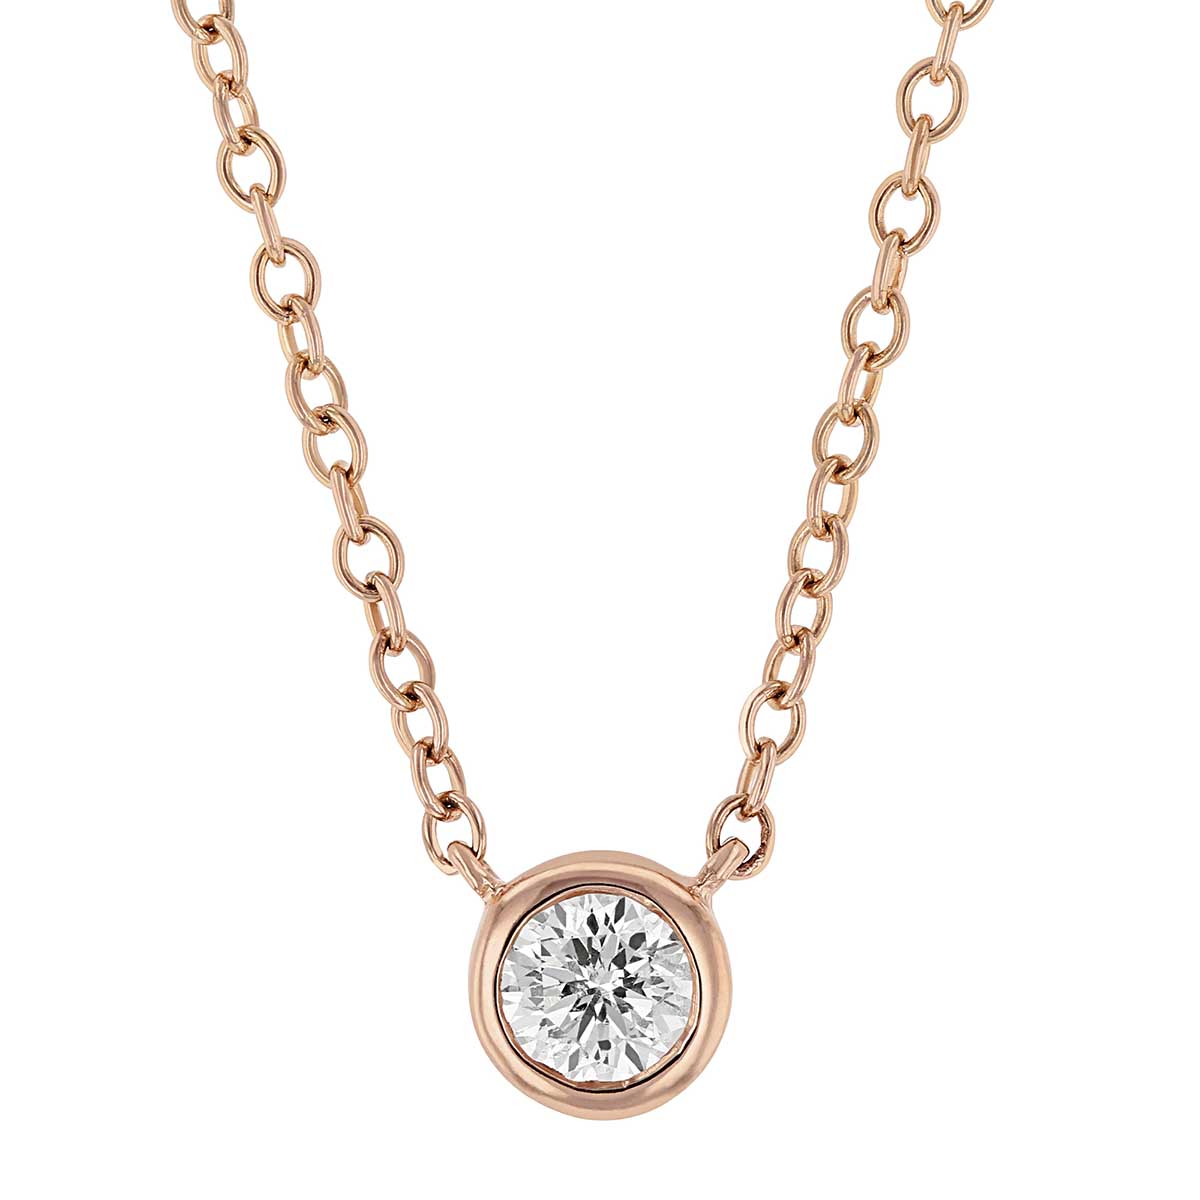 c9c44c8937 Diamond Jewelry - April Birthstone Jewelry | Borsheims